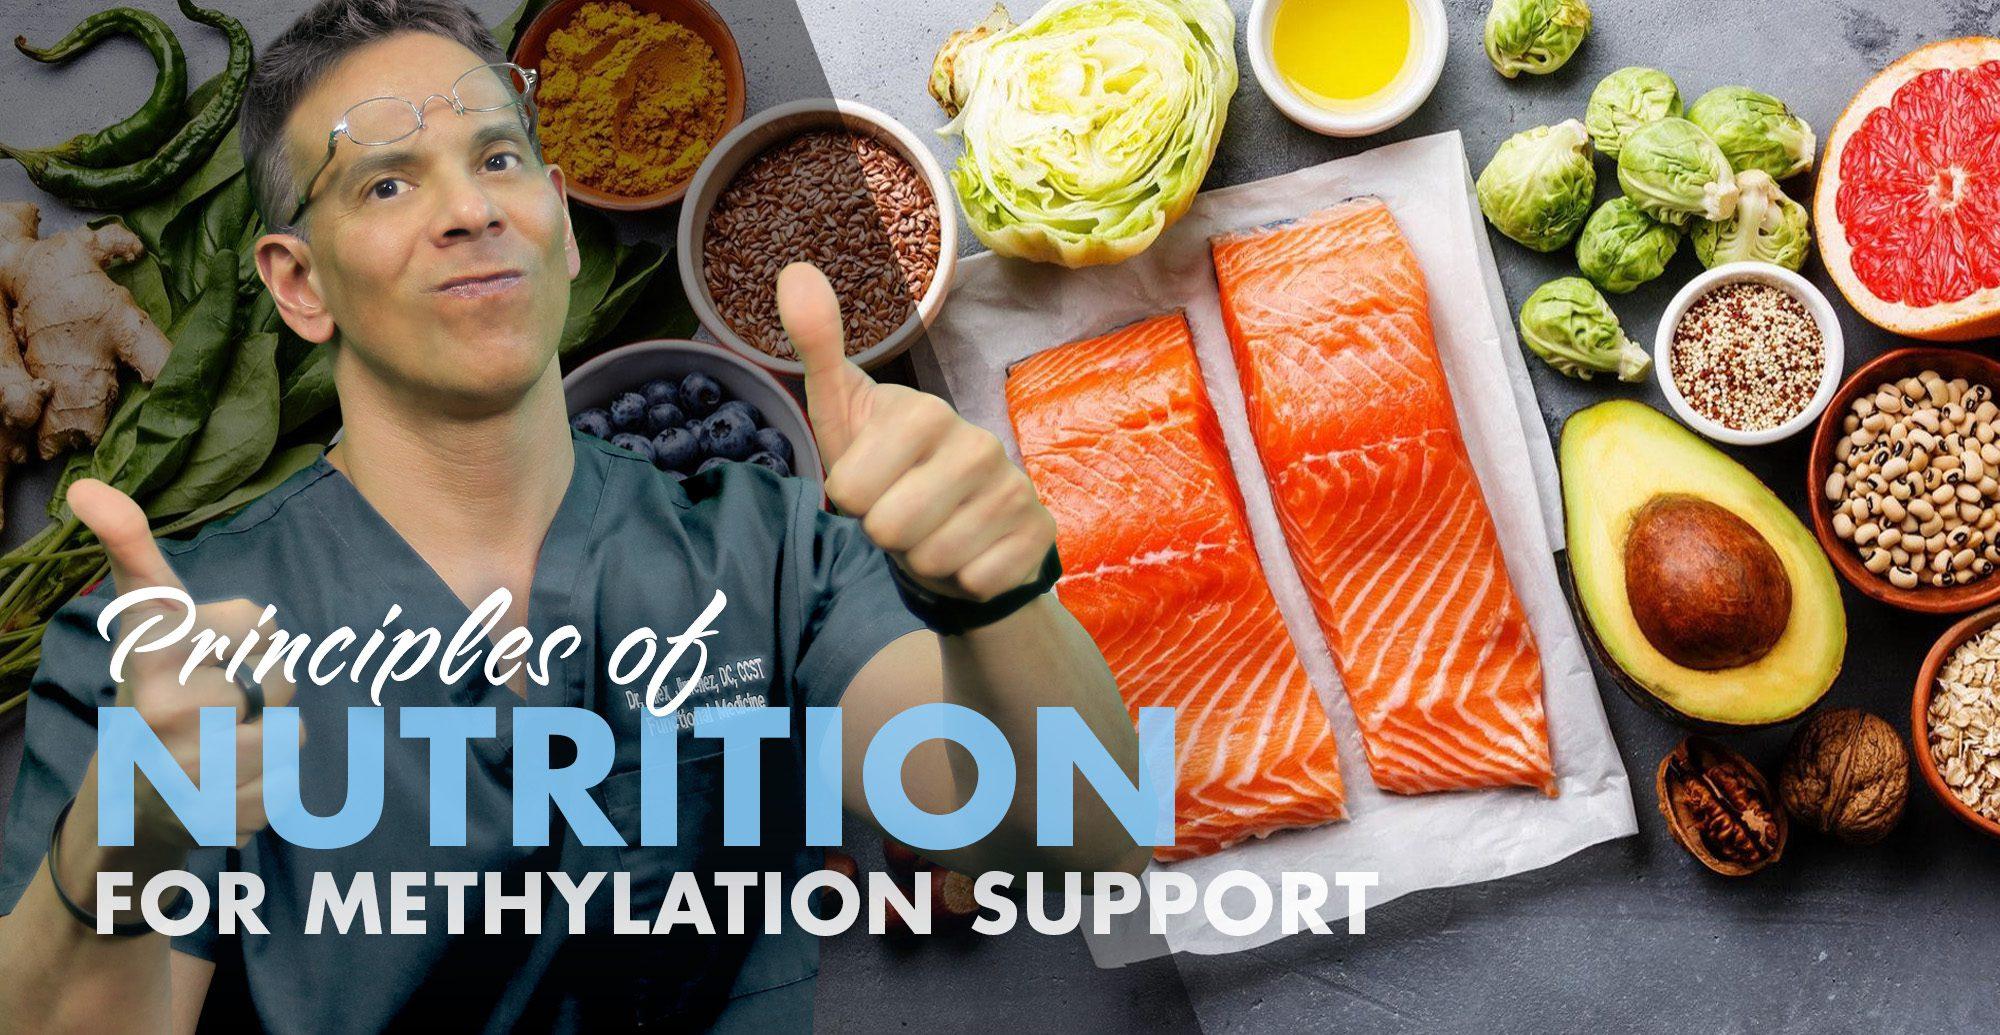 Principles of Nutrition for Methylation Support | El Paso, TX Chiropractor